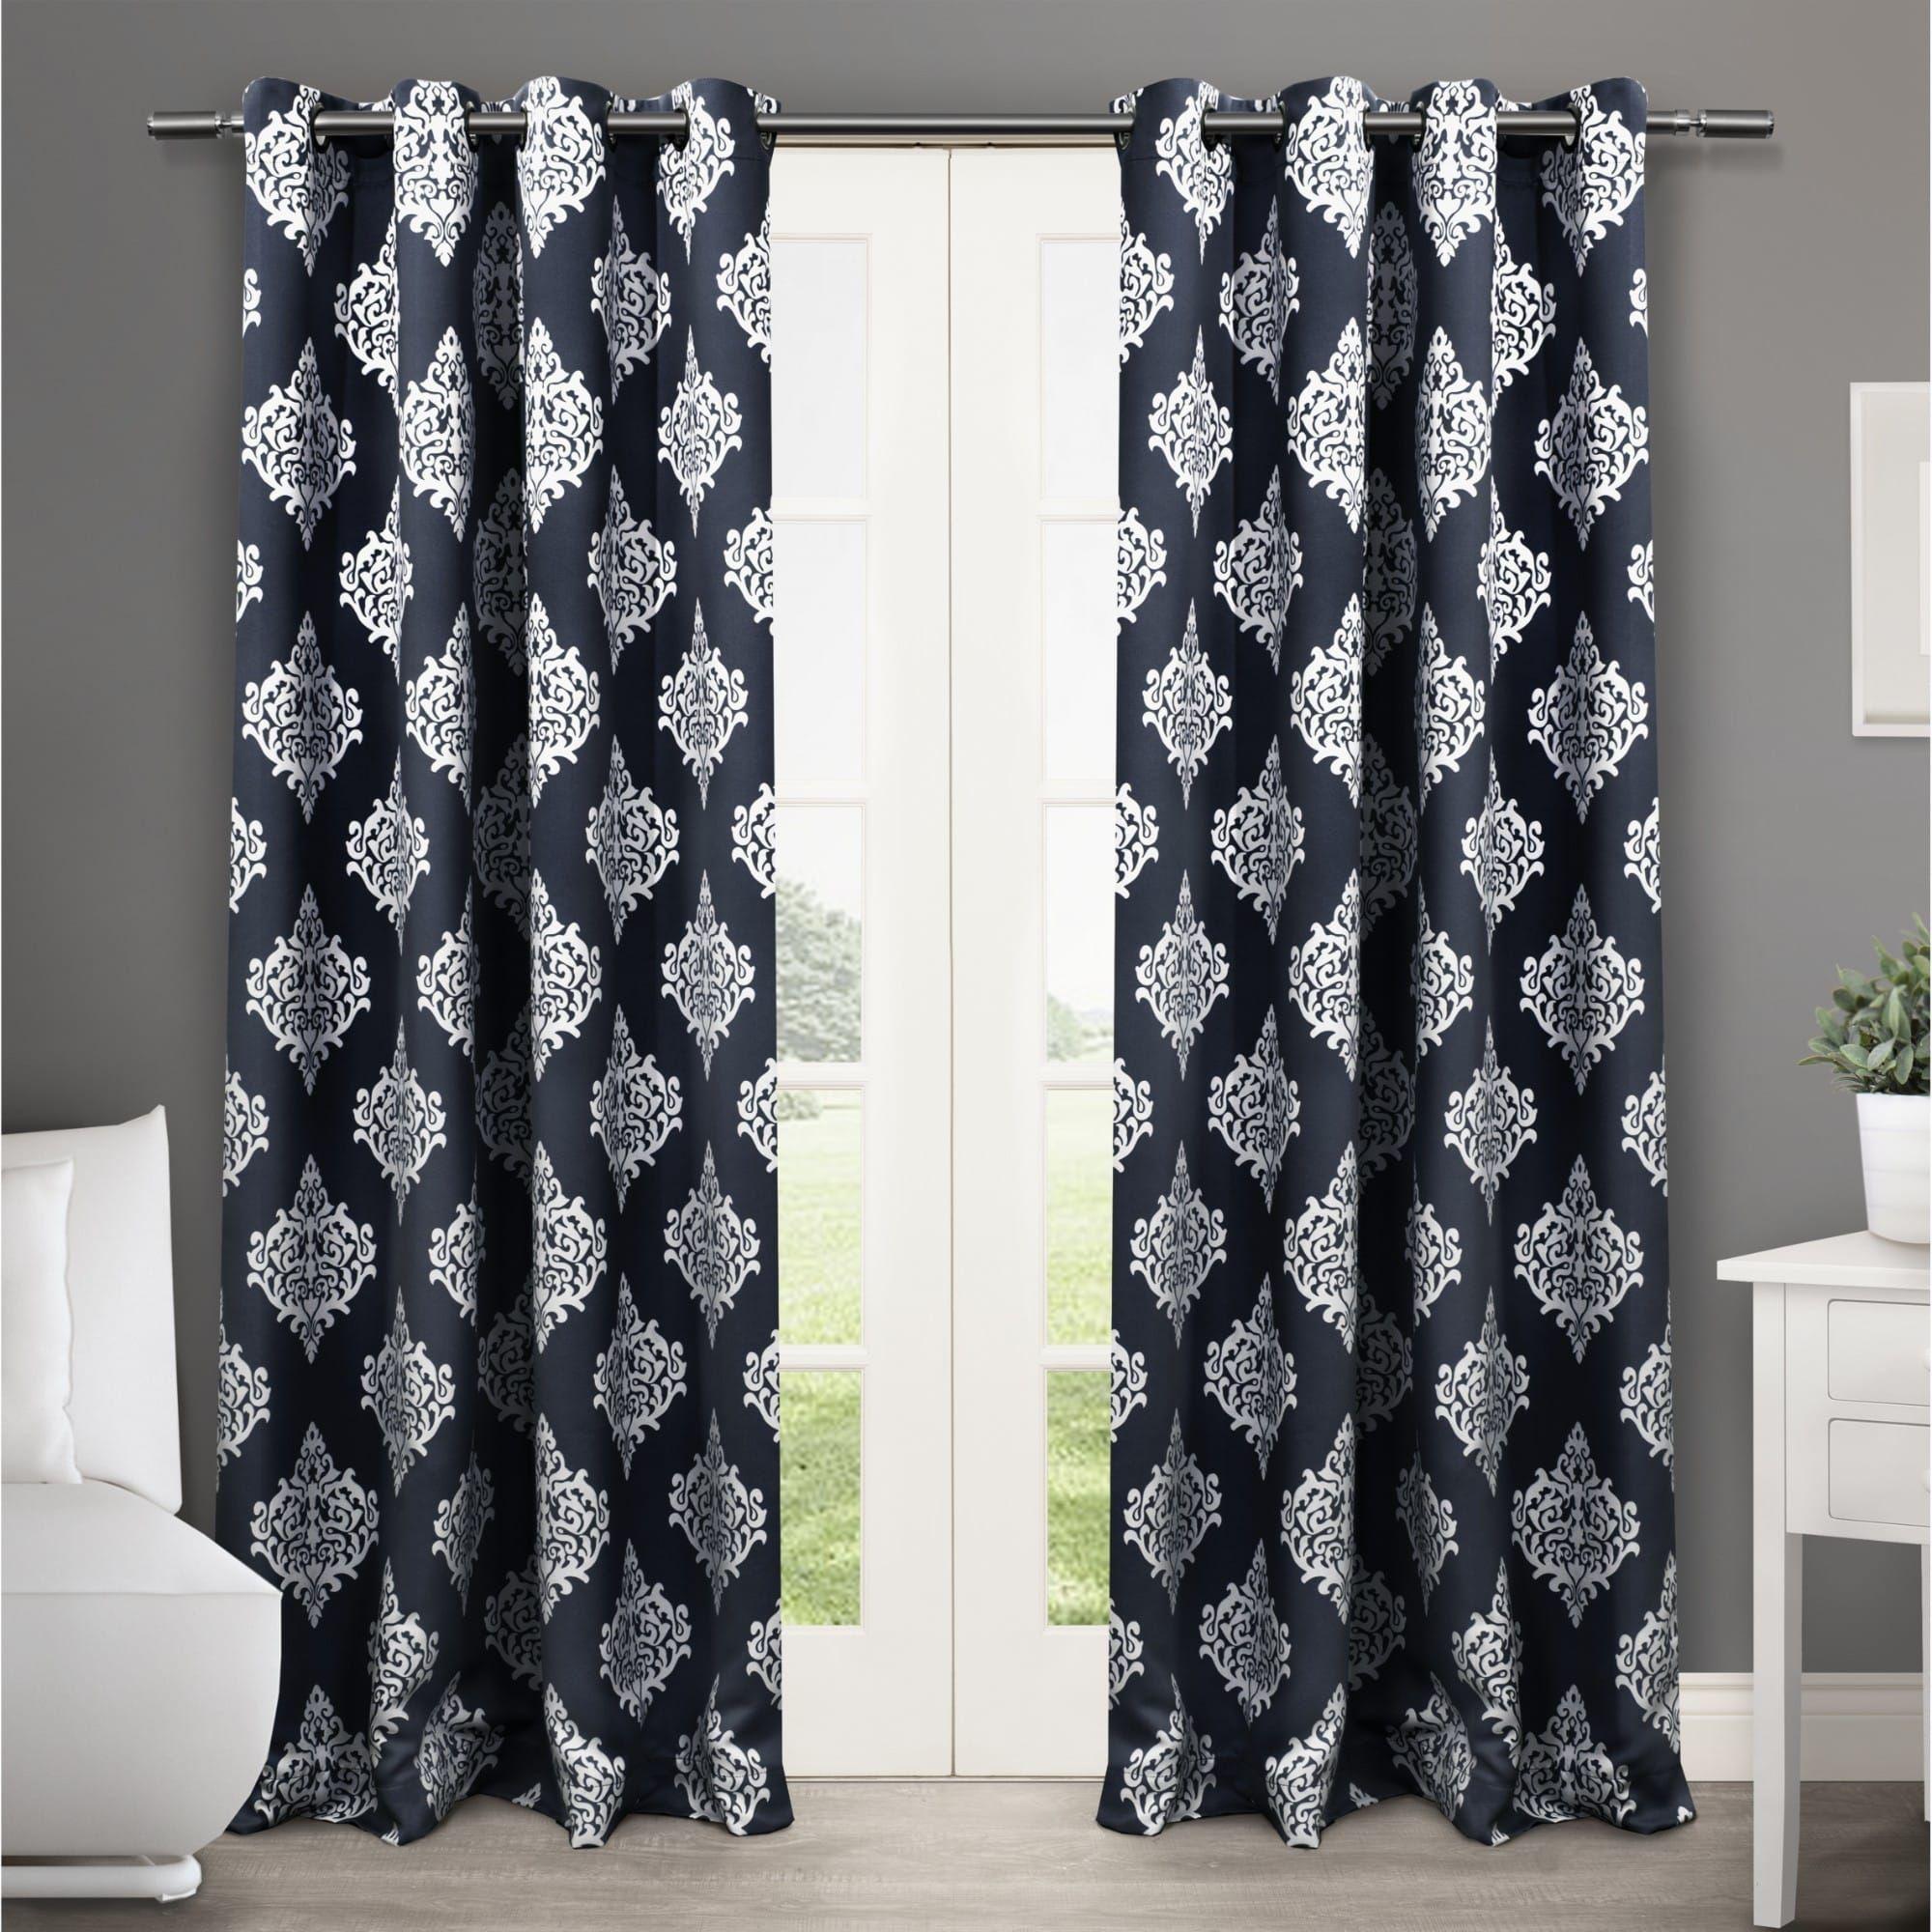 Gracewood Hollow Corine Medallion Pattern Blackout Curtain Panel